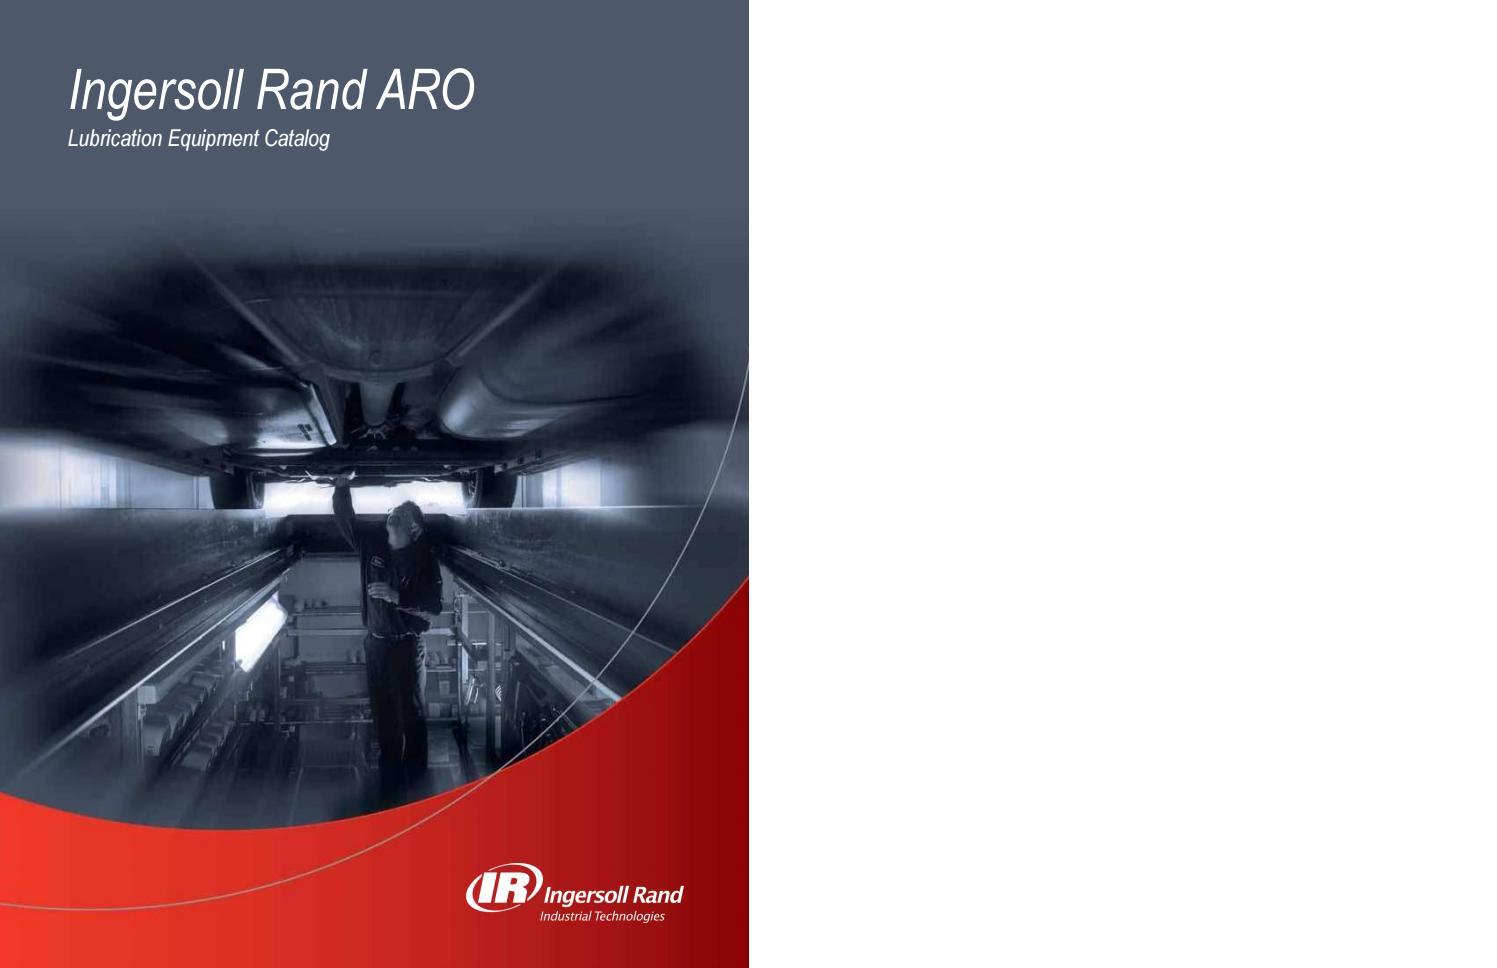 Black Ingersoll Rand ARO 100067 Regulator Gauge 0-160 PSIG